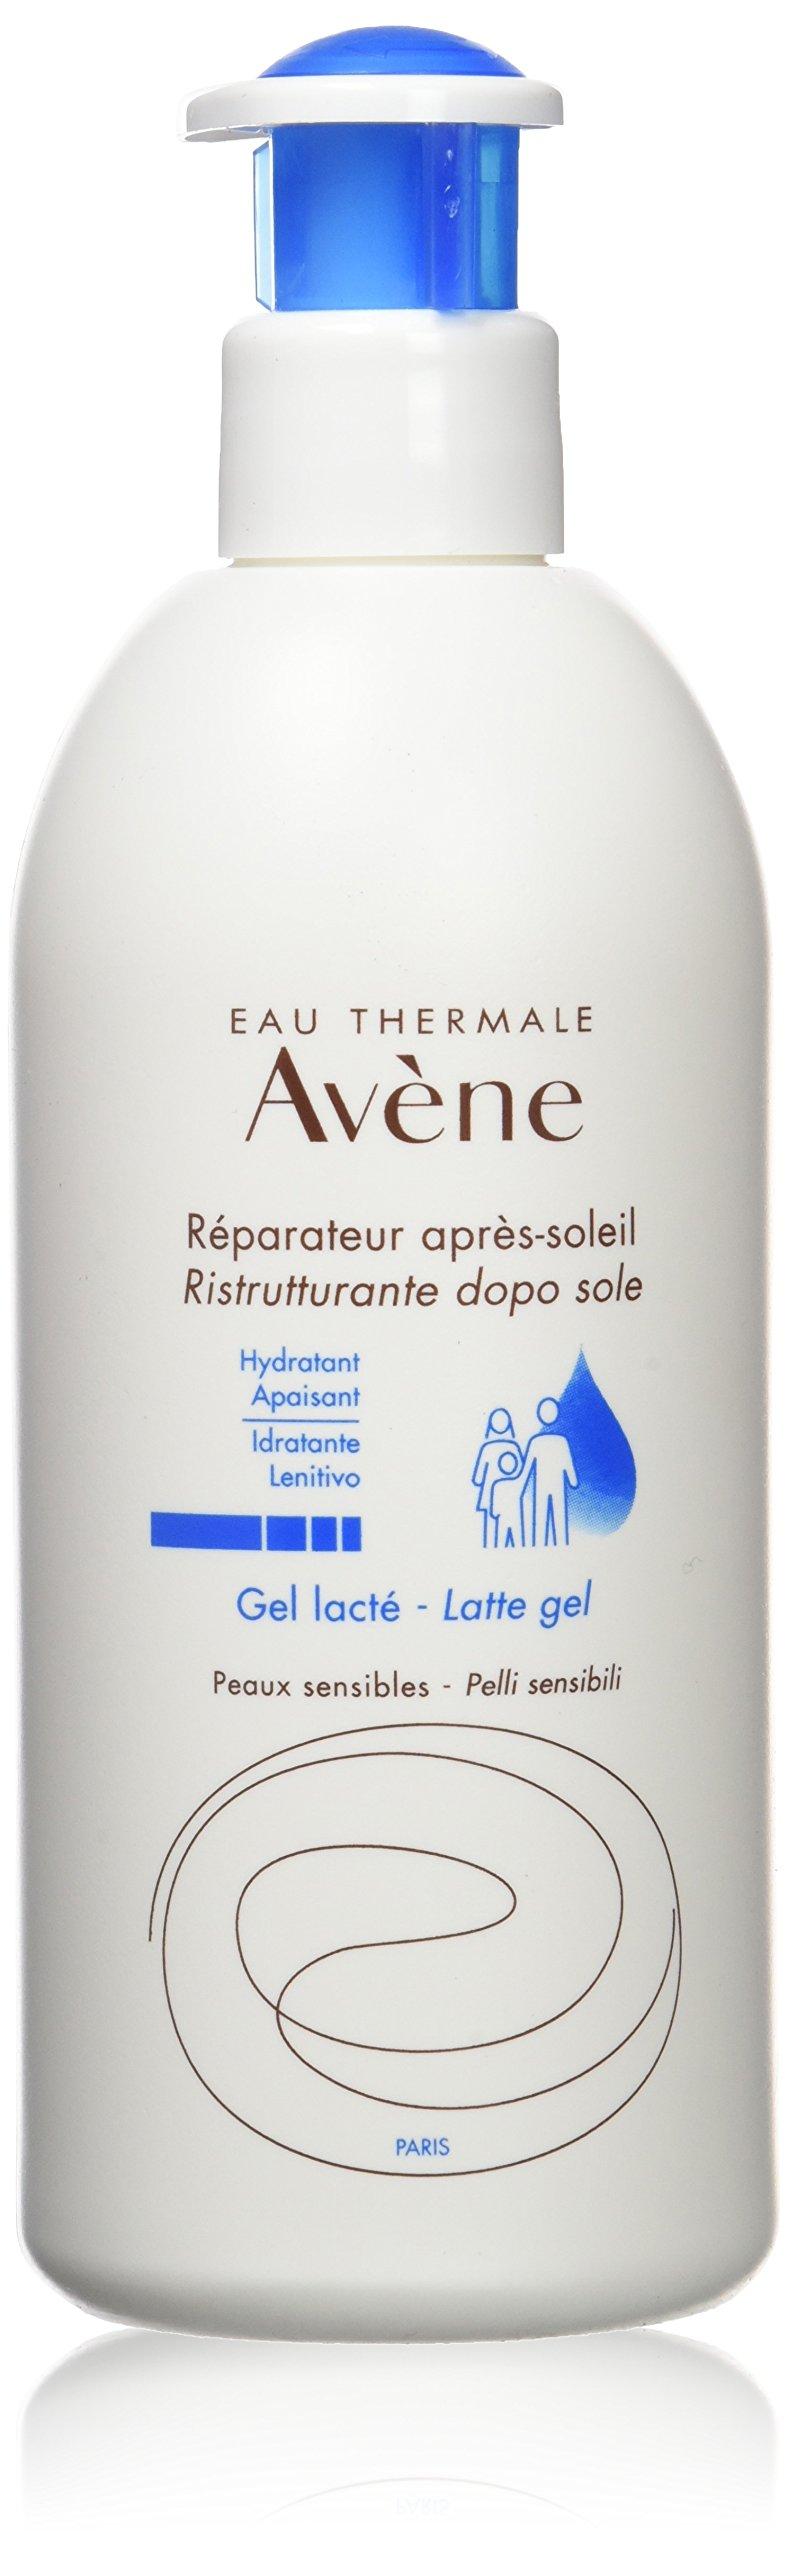 Eau Thermale Avène After-Sun Repair Creamy Gel, 13.52 fl. oz.